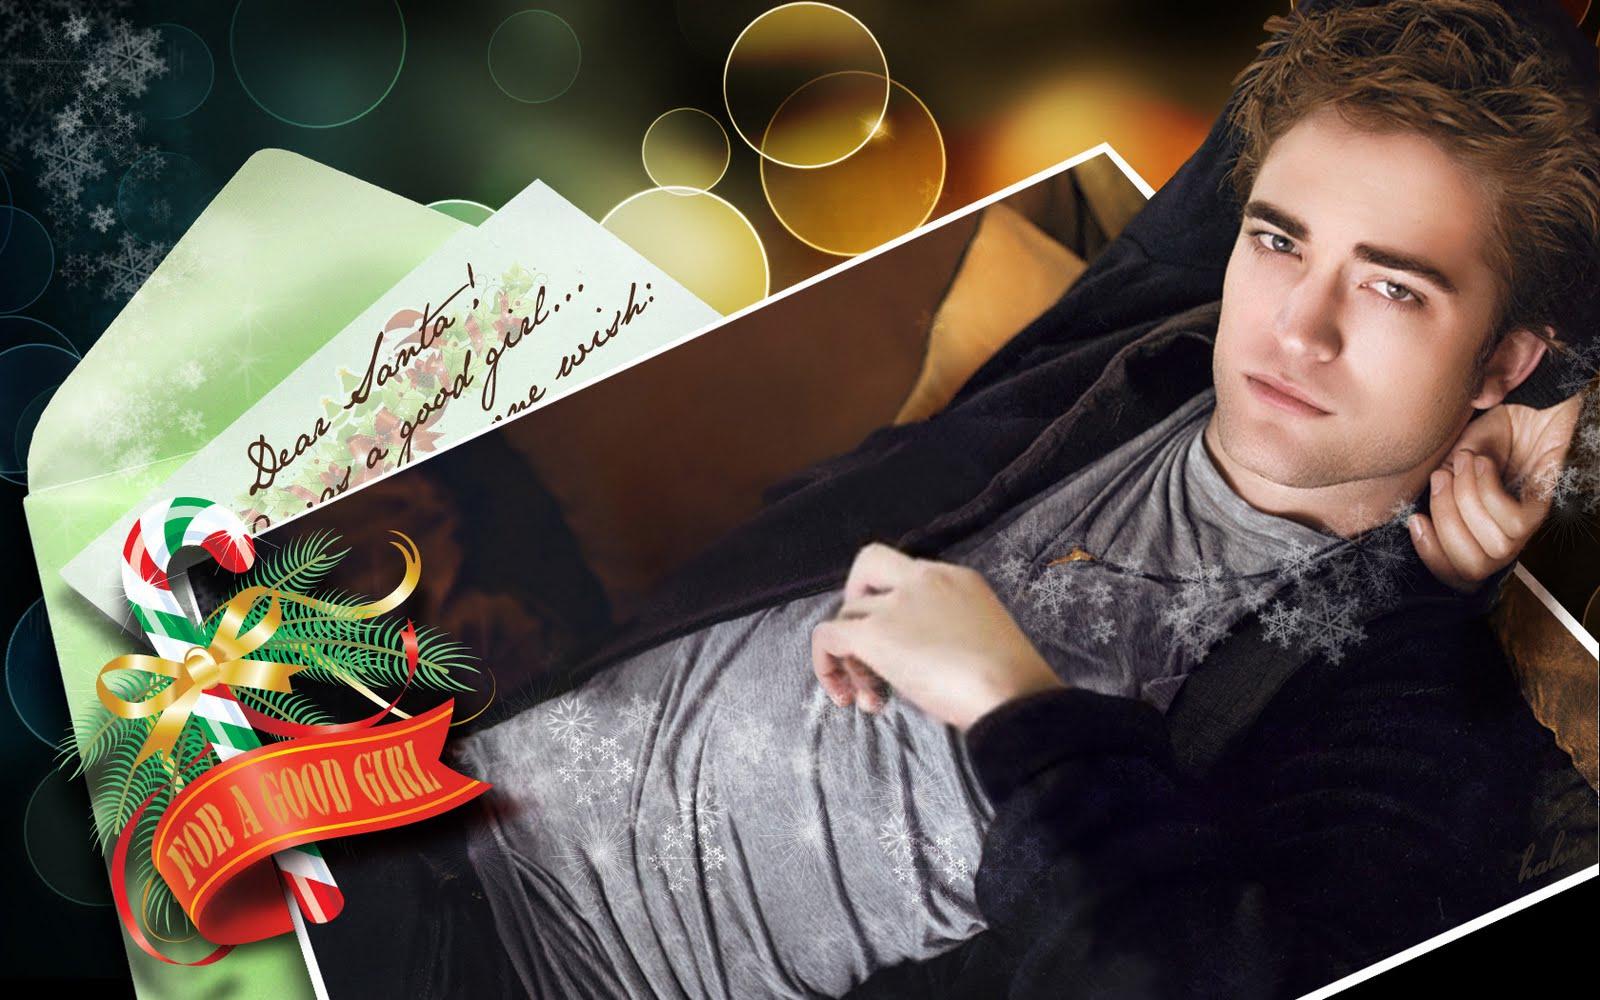 http://4.bp.blogspot.com/_iNW0qFfSmFM/TMuJkxeTS5I/AAAAAAAADmY/HiS0saTSbIs/s1600/Christmas-present-robert-pattinson-9372109-1680-1050.jpg